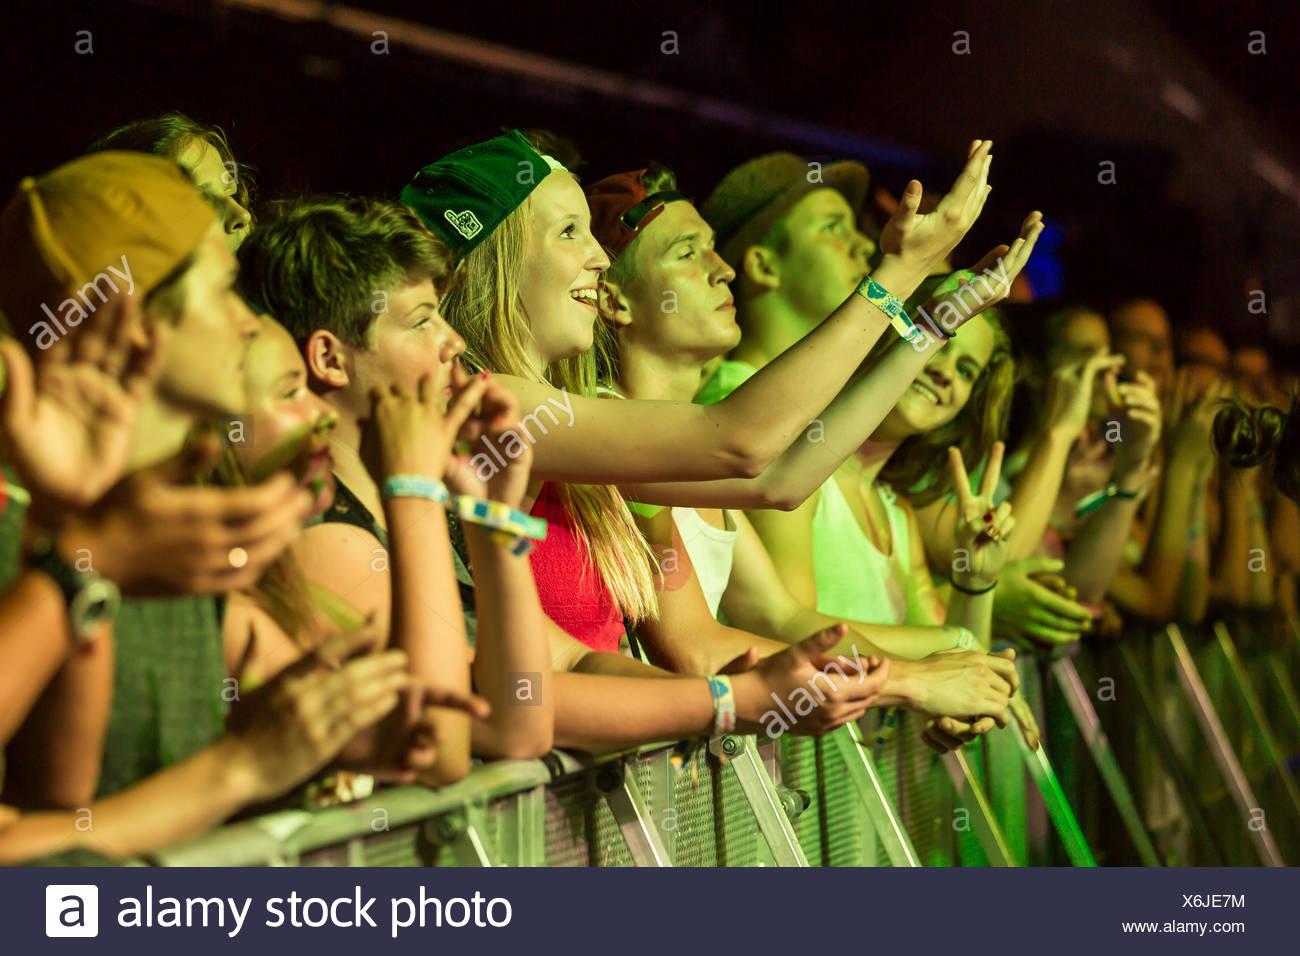 Kodaline (Fans) - Stock Image